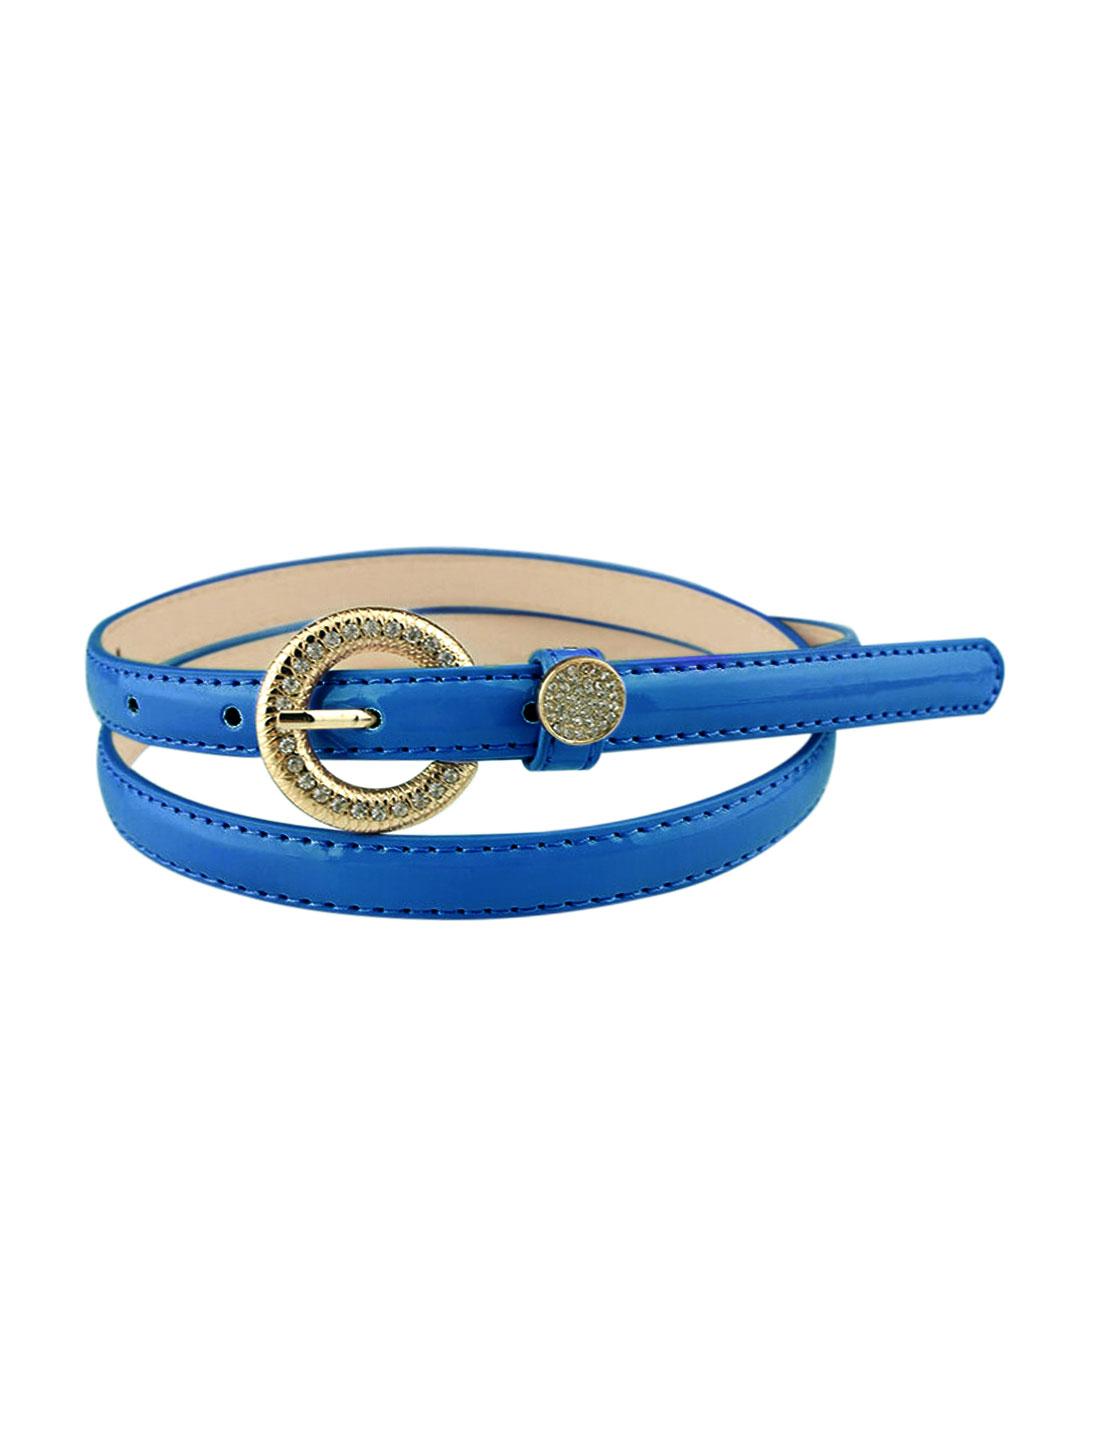 Women Rhinestone Decor Single Pin Buckle Waist Belt Royal Blue